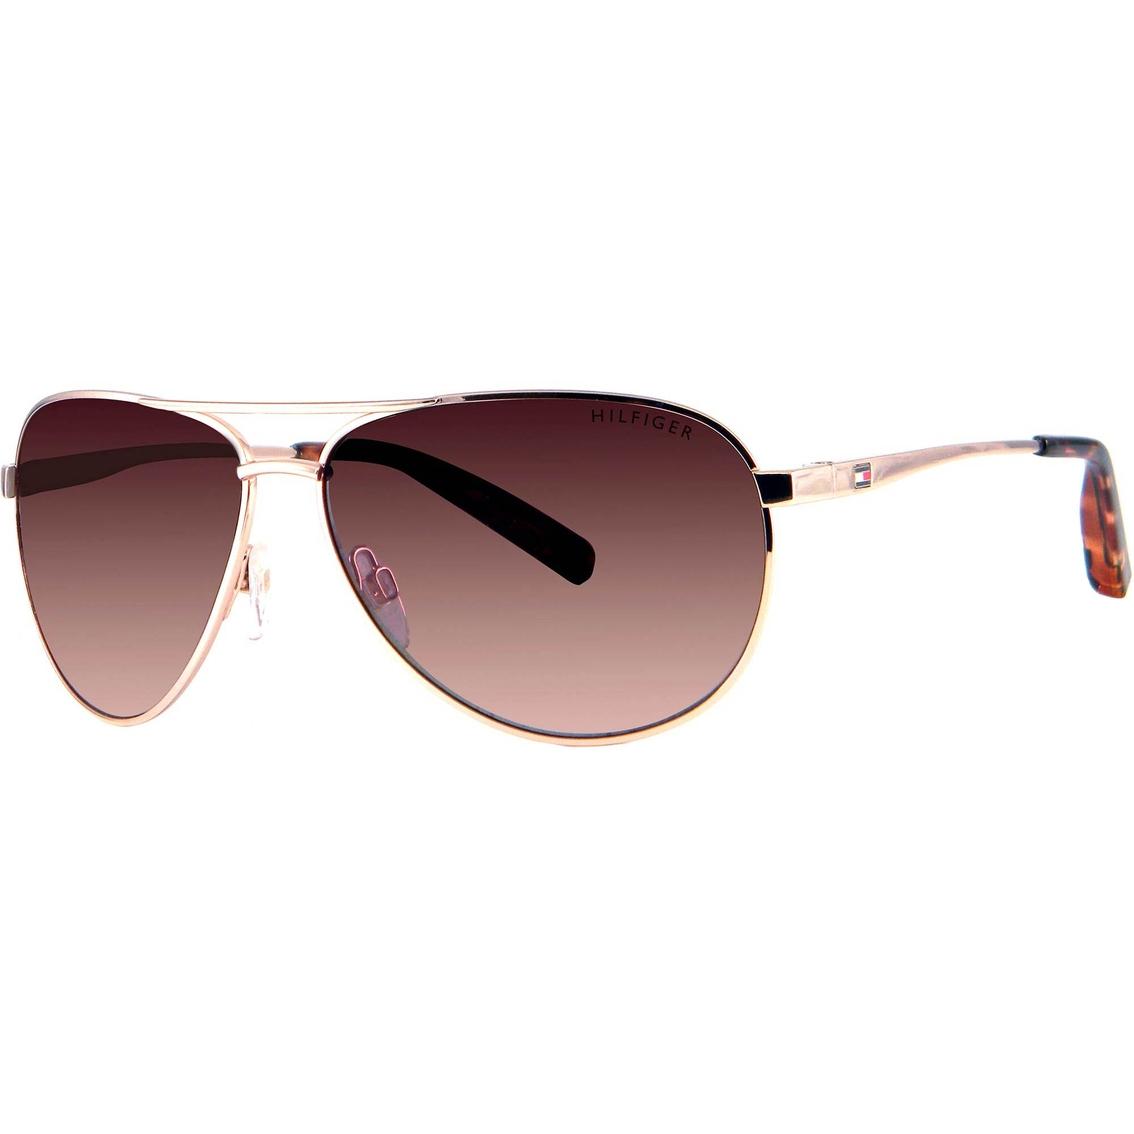 adec782cd8 Tommy Hilfiger Aviator Sunglasses Lad179